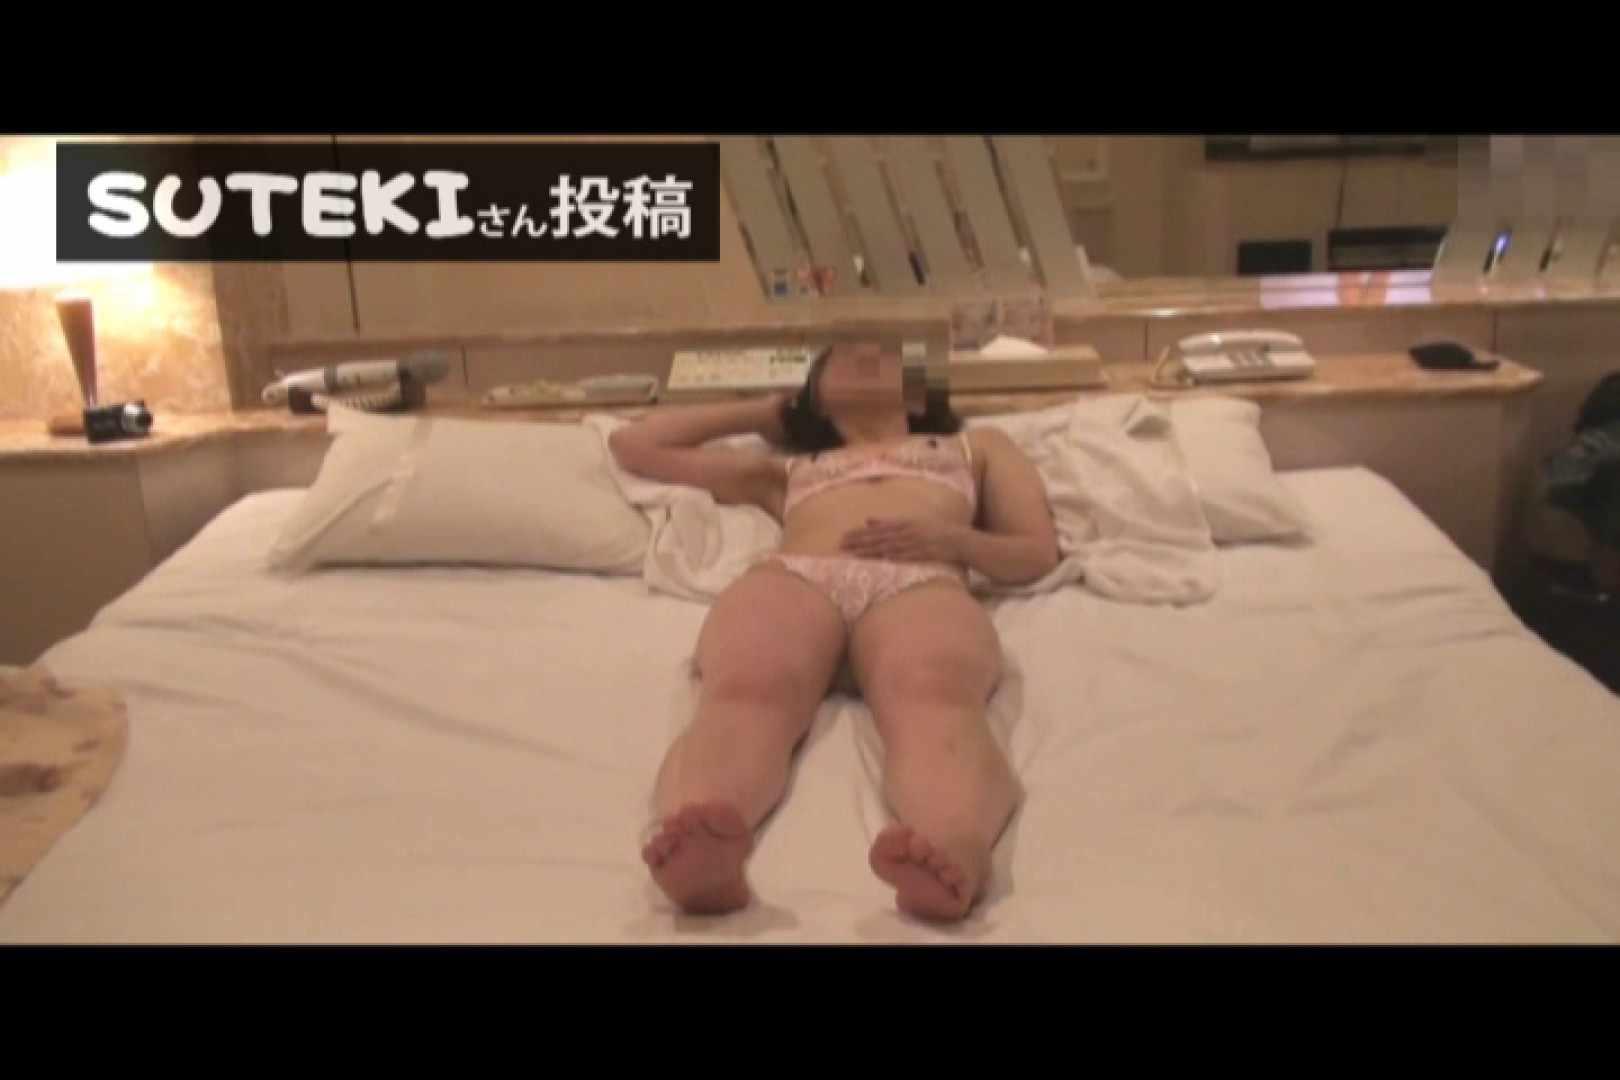 SUTEKIさん投稿 Hな記録、ピンクオープンブラ 投稿 戯れ無修正画像 99pic 3